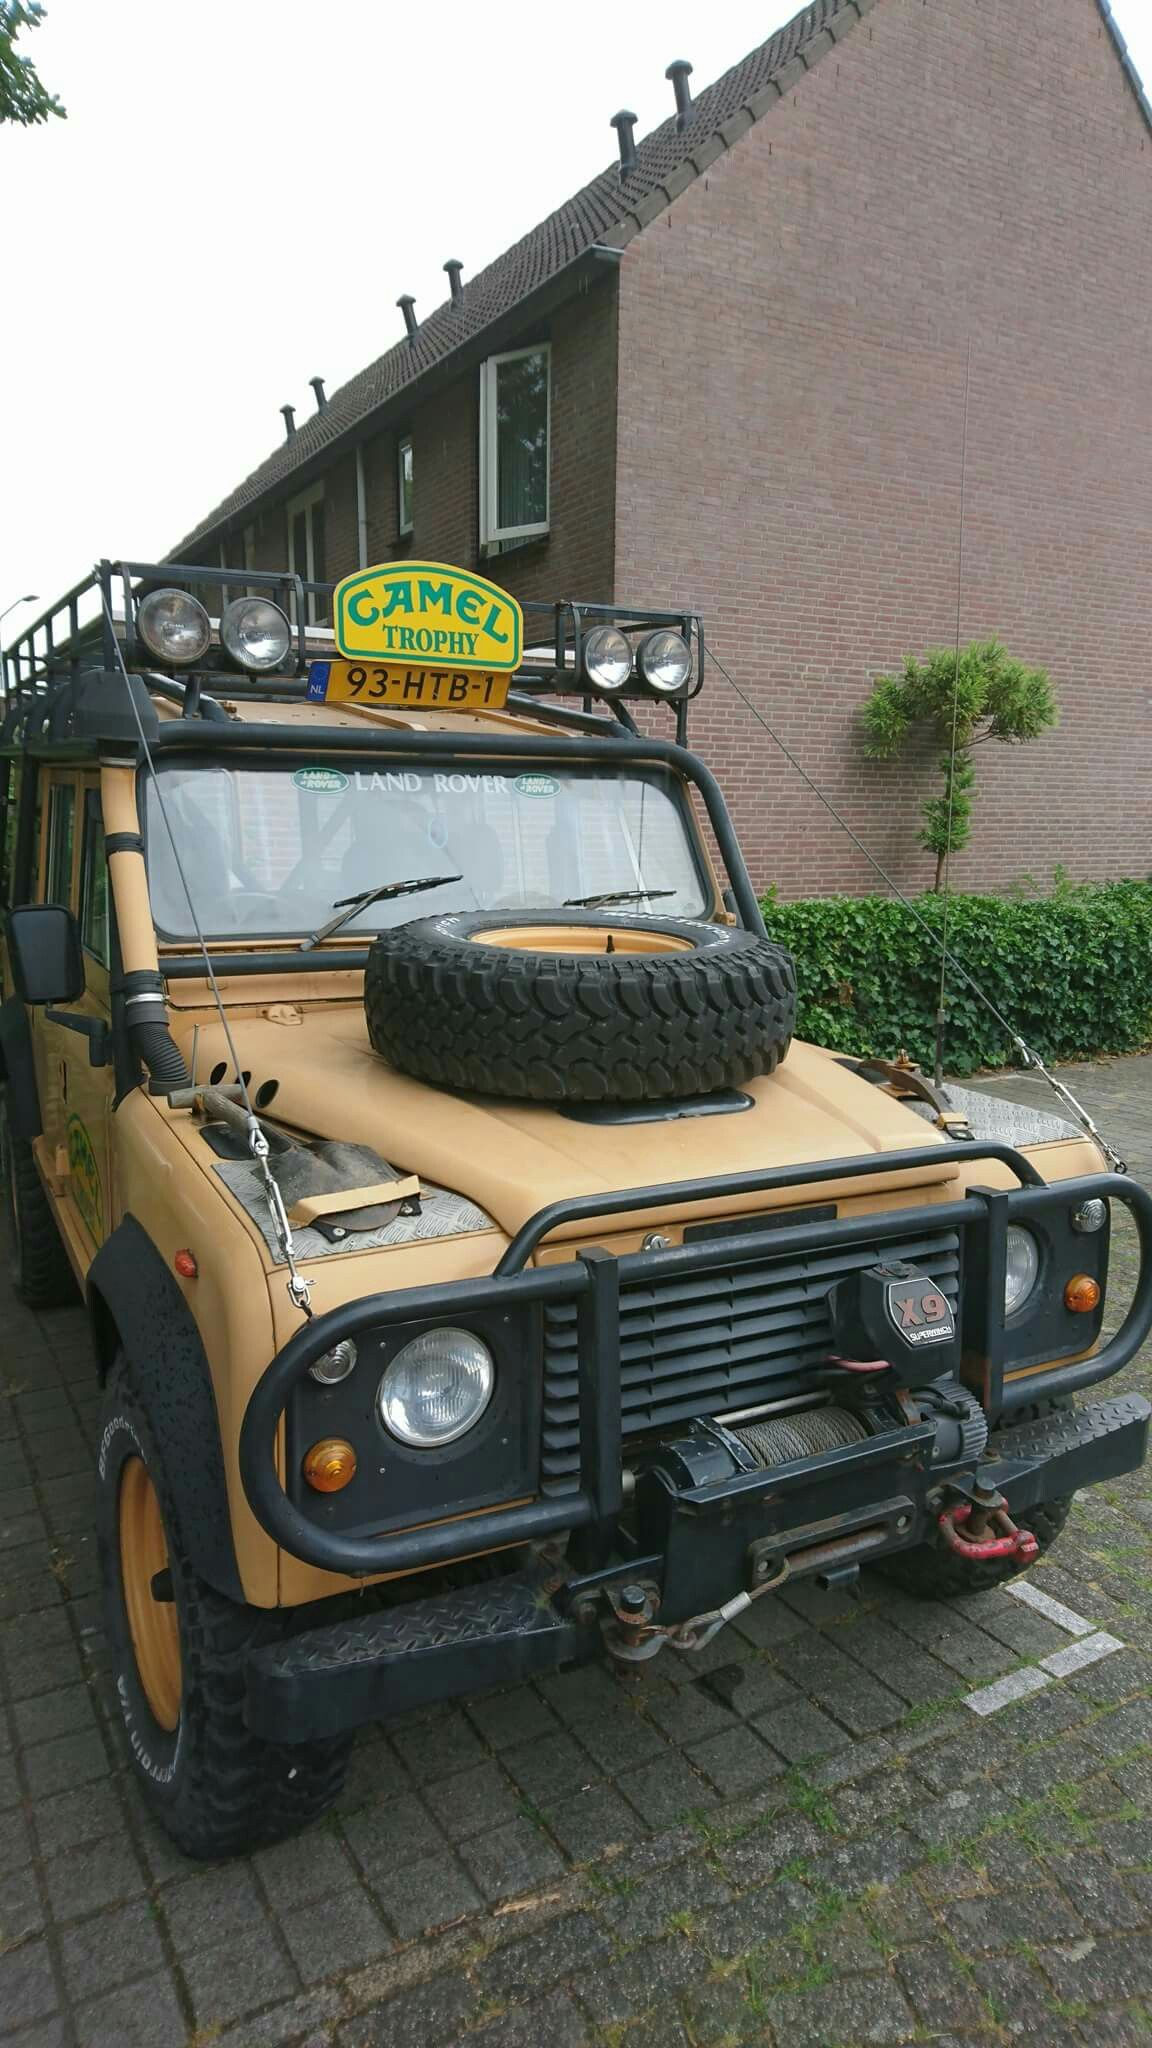 Land Rover Defender 110 Tdi Sw Camel Trophy adventure team e of